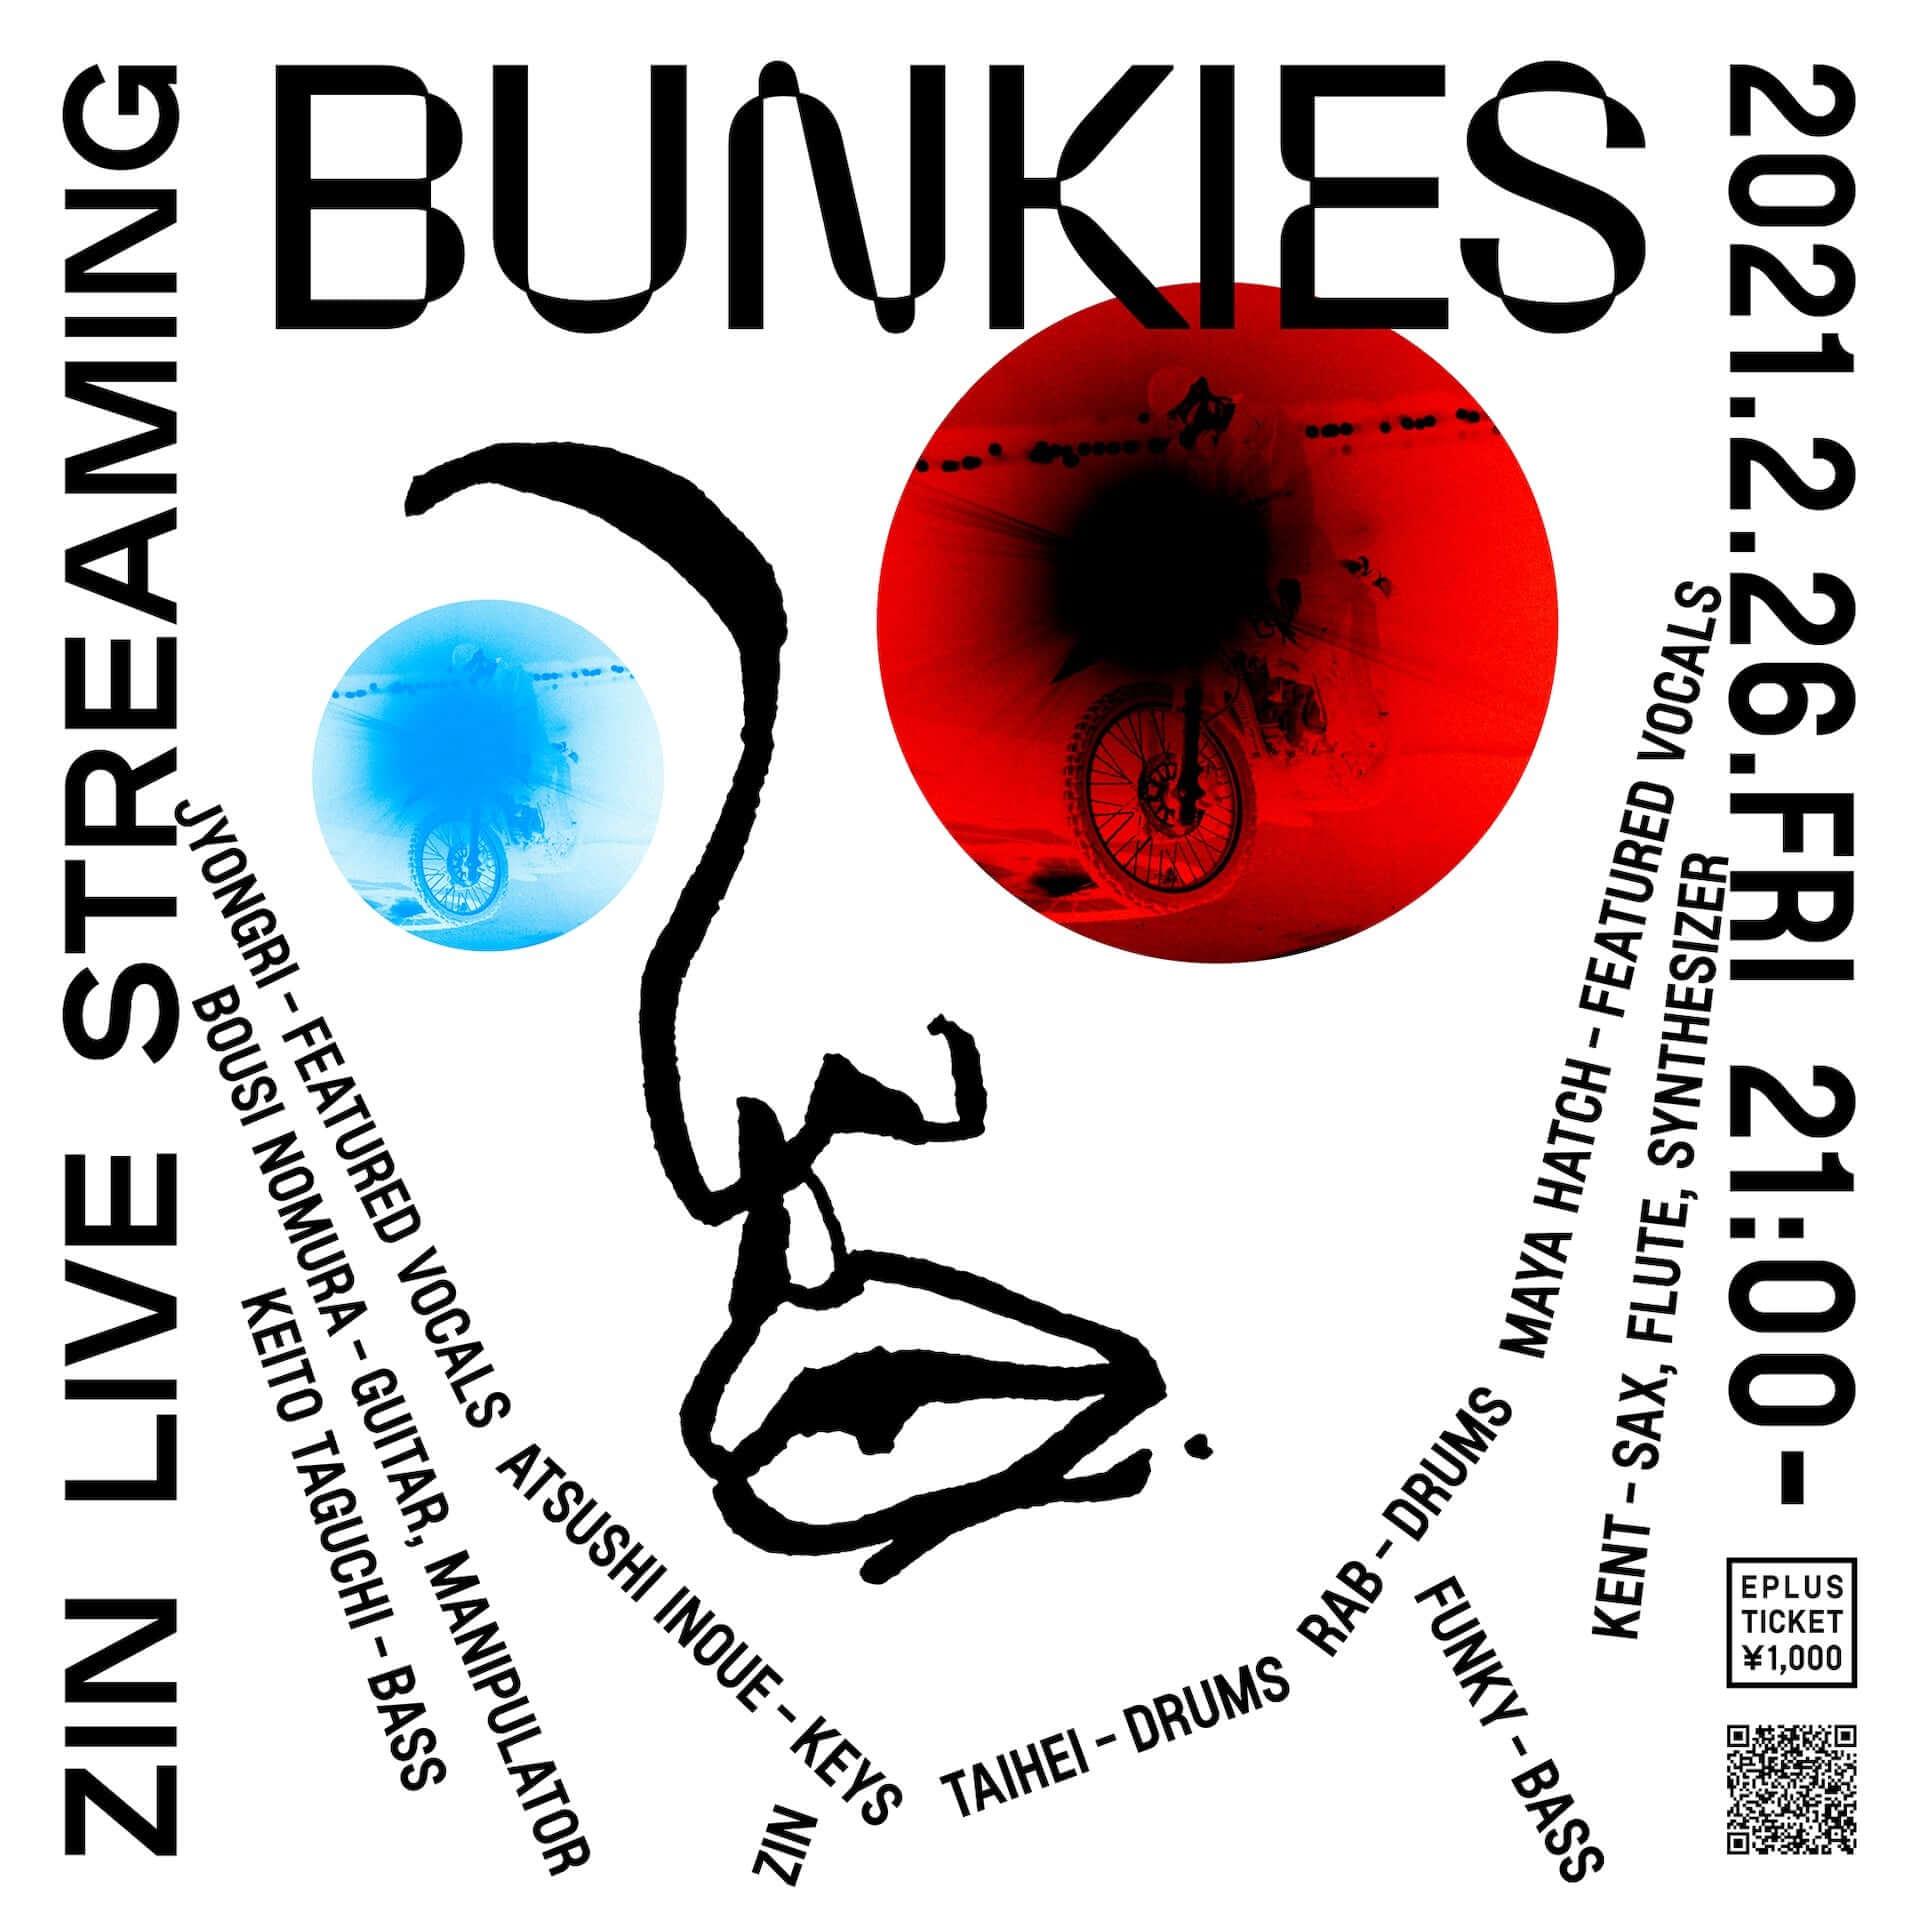 Soulflex所属のZINが配信ライブ<BUNKIES>を開催決定!井上惇志、田口恵人、JYONGRI、Maya Hatchらが出演 music210215_zin_1-1920x1920